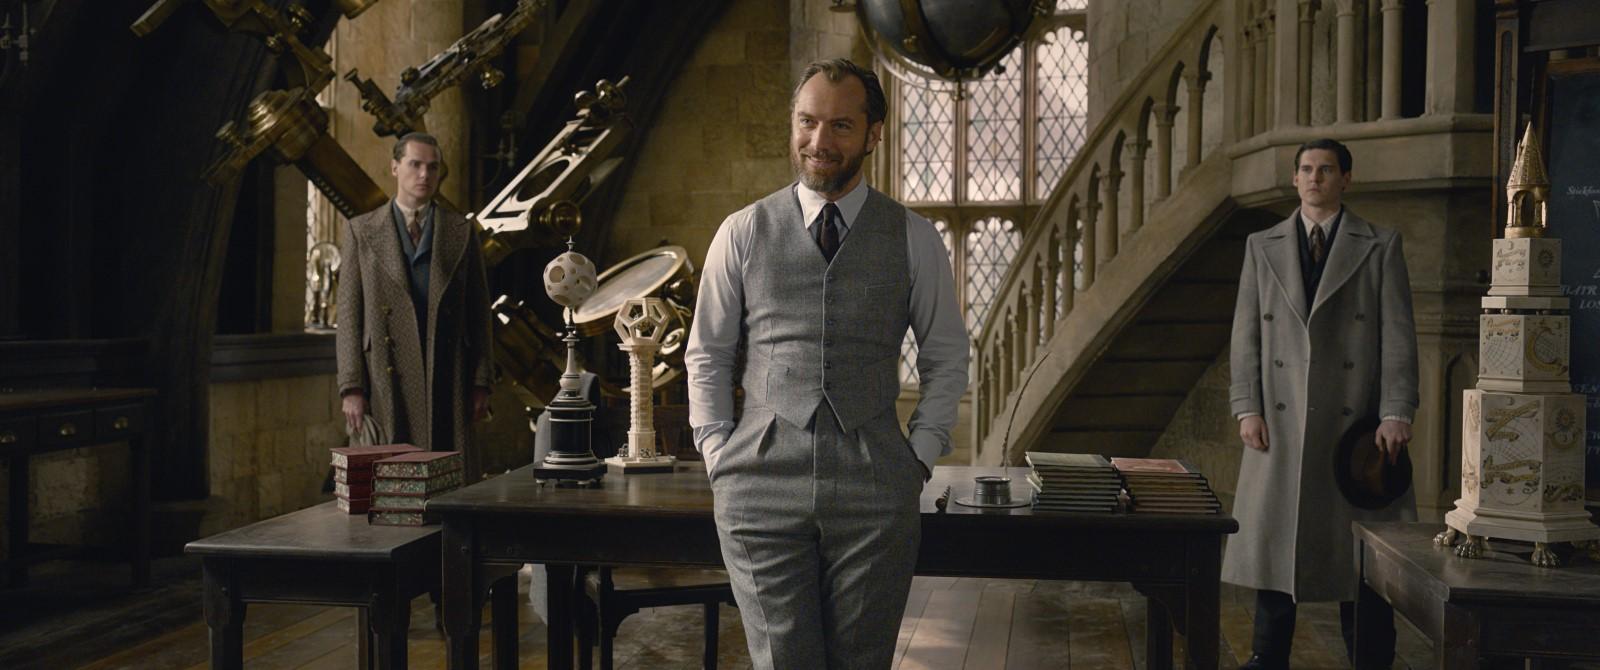 Dumbledore à Poudlard dans les Crimes de Grindelwald